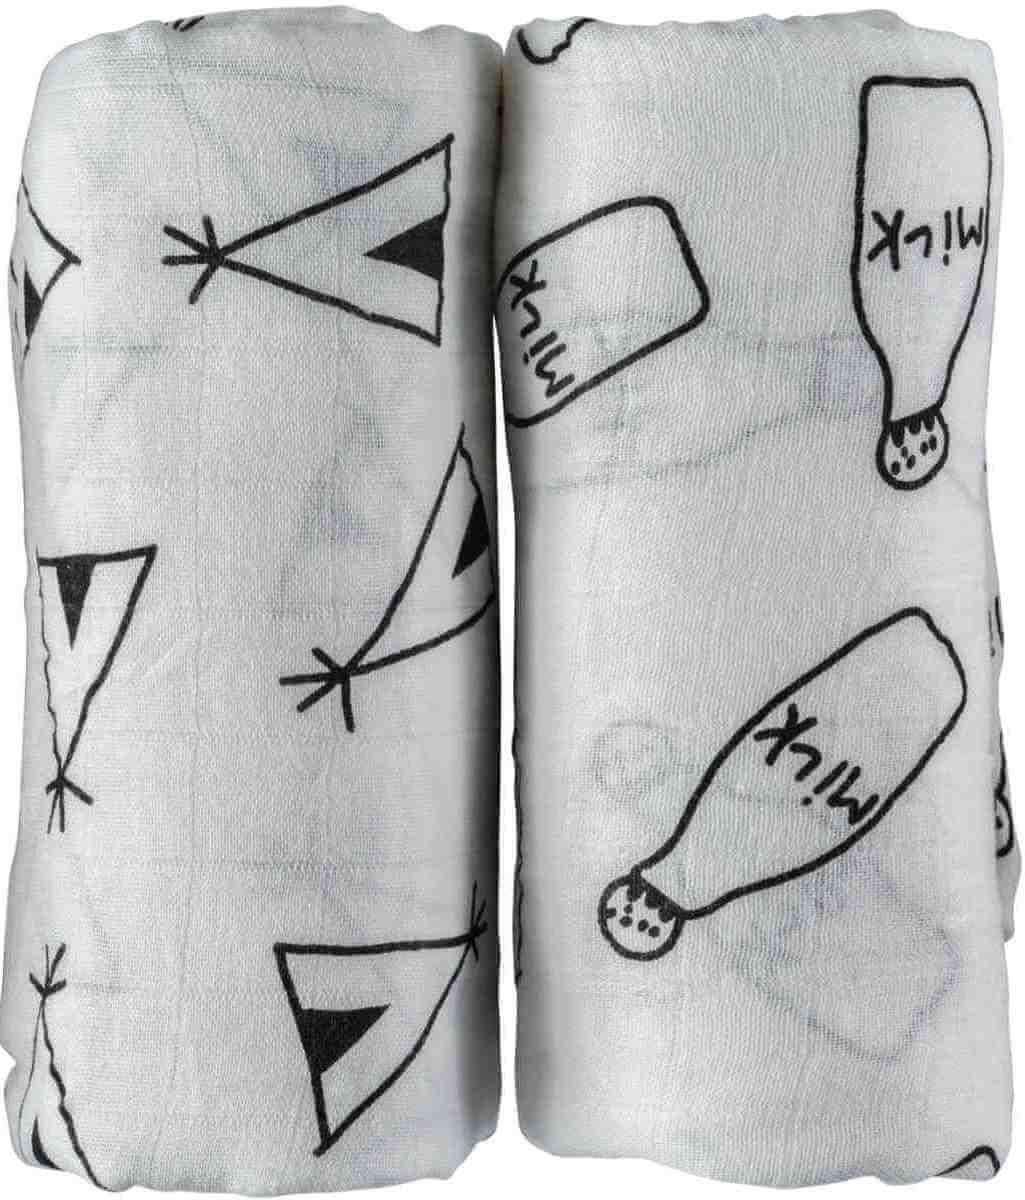 NEVO זוג חיתולי טטרה במבוק גדולים במיוחד באריזת מתנה - עיצוב שחור ולבןתמונה של